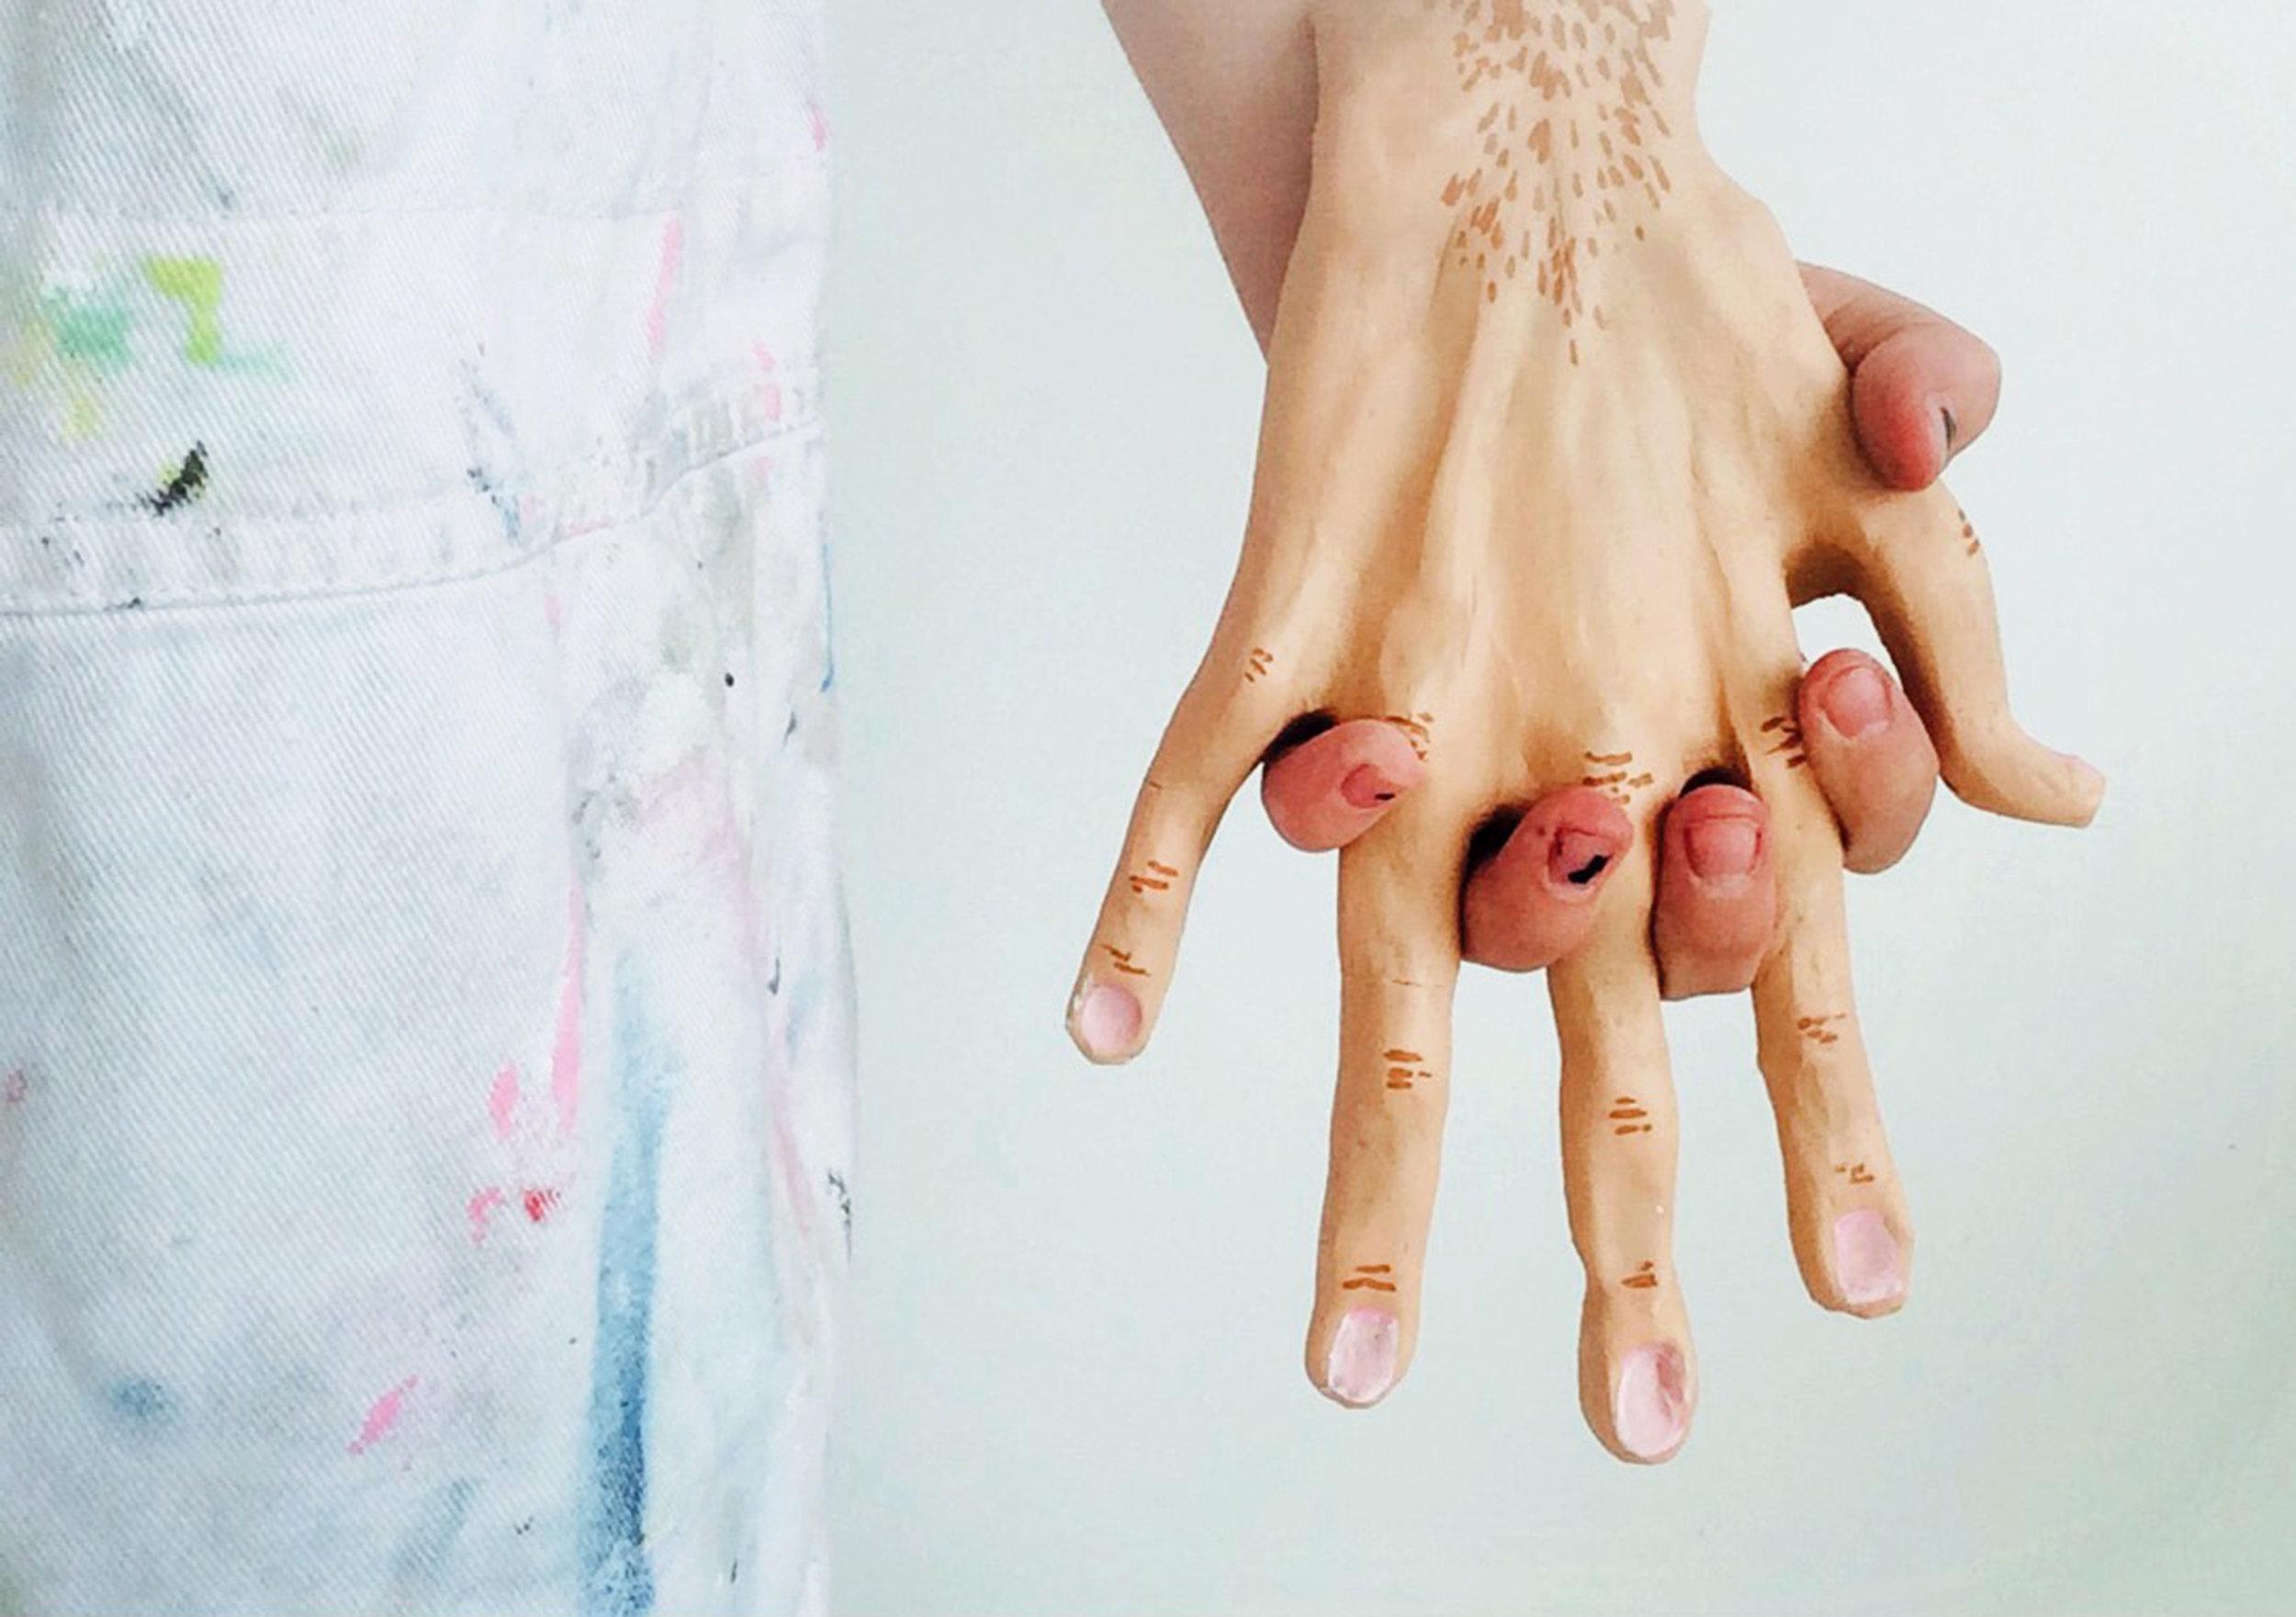 6. My Man 6_ Holding hands .jpg